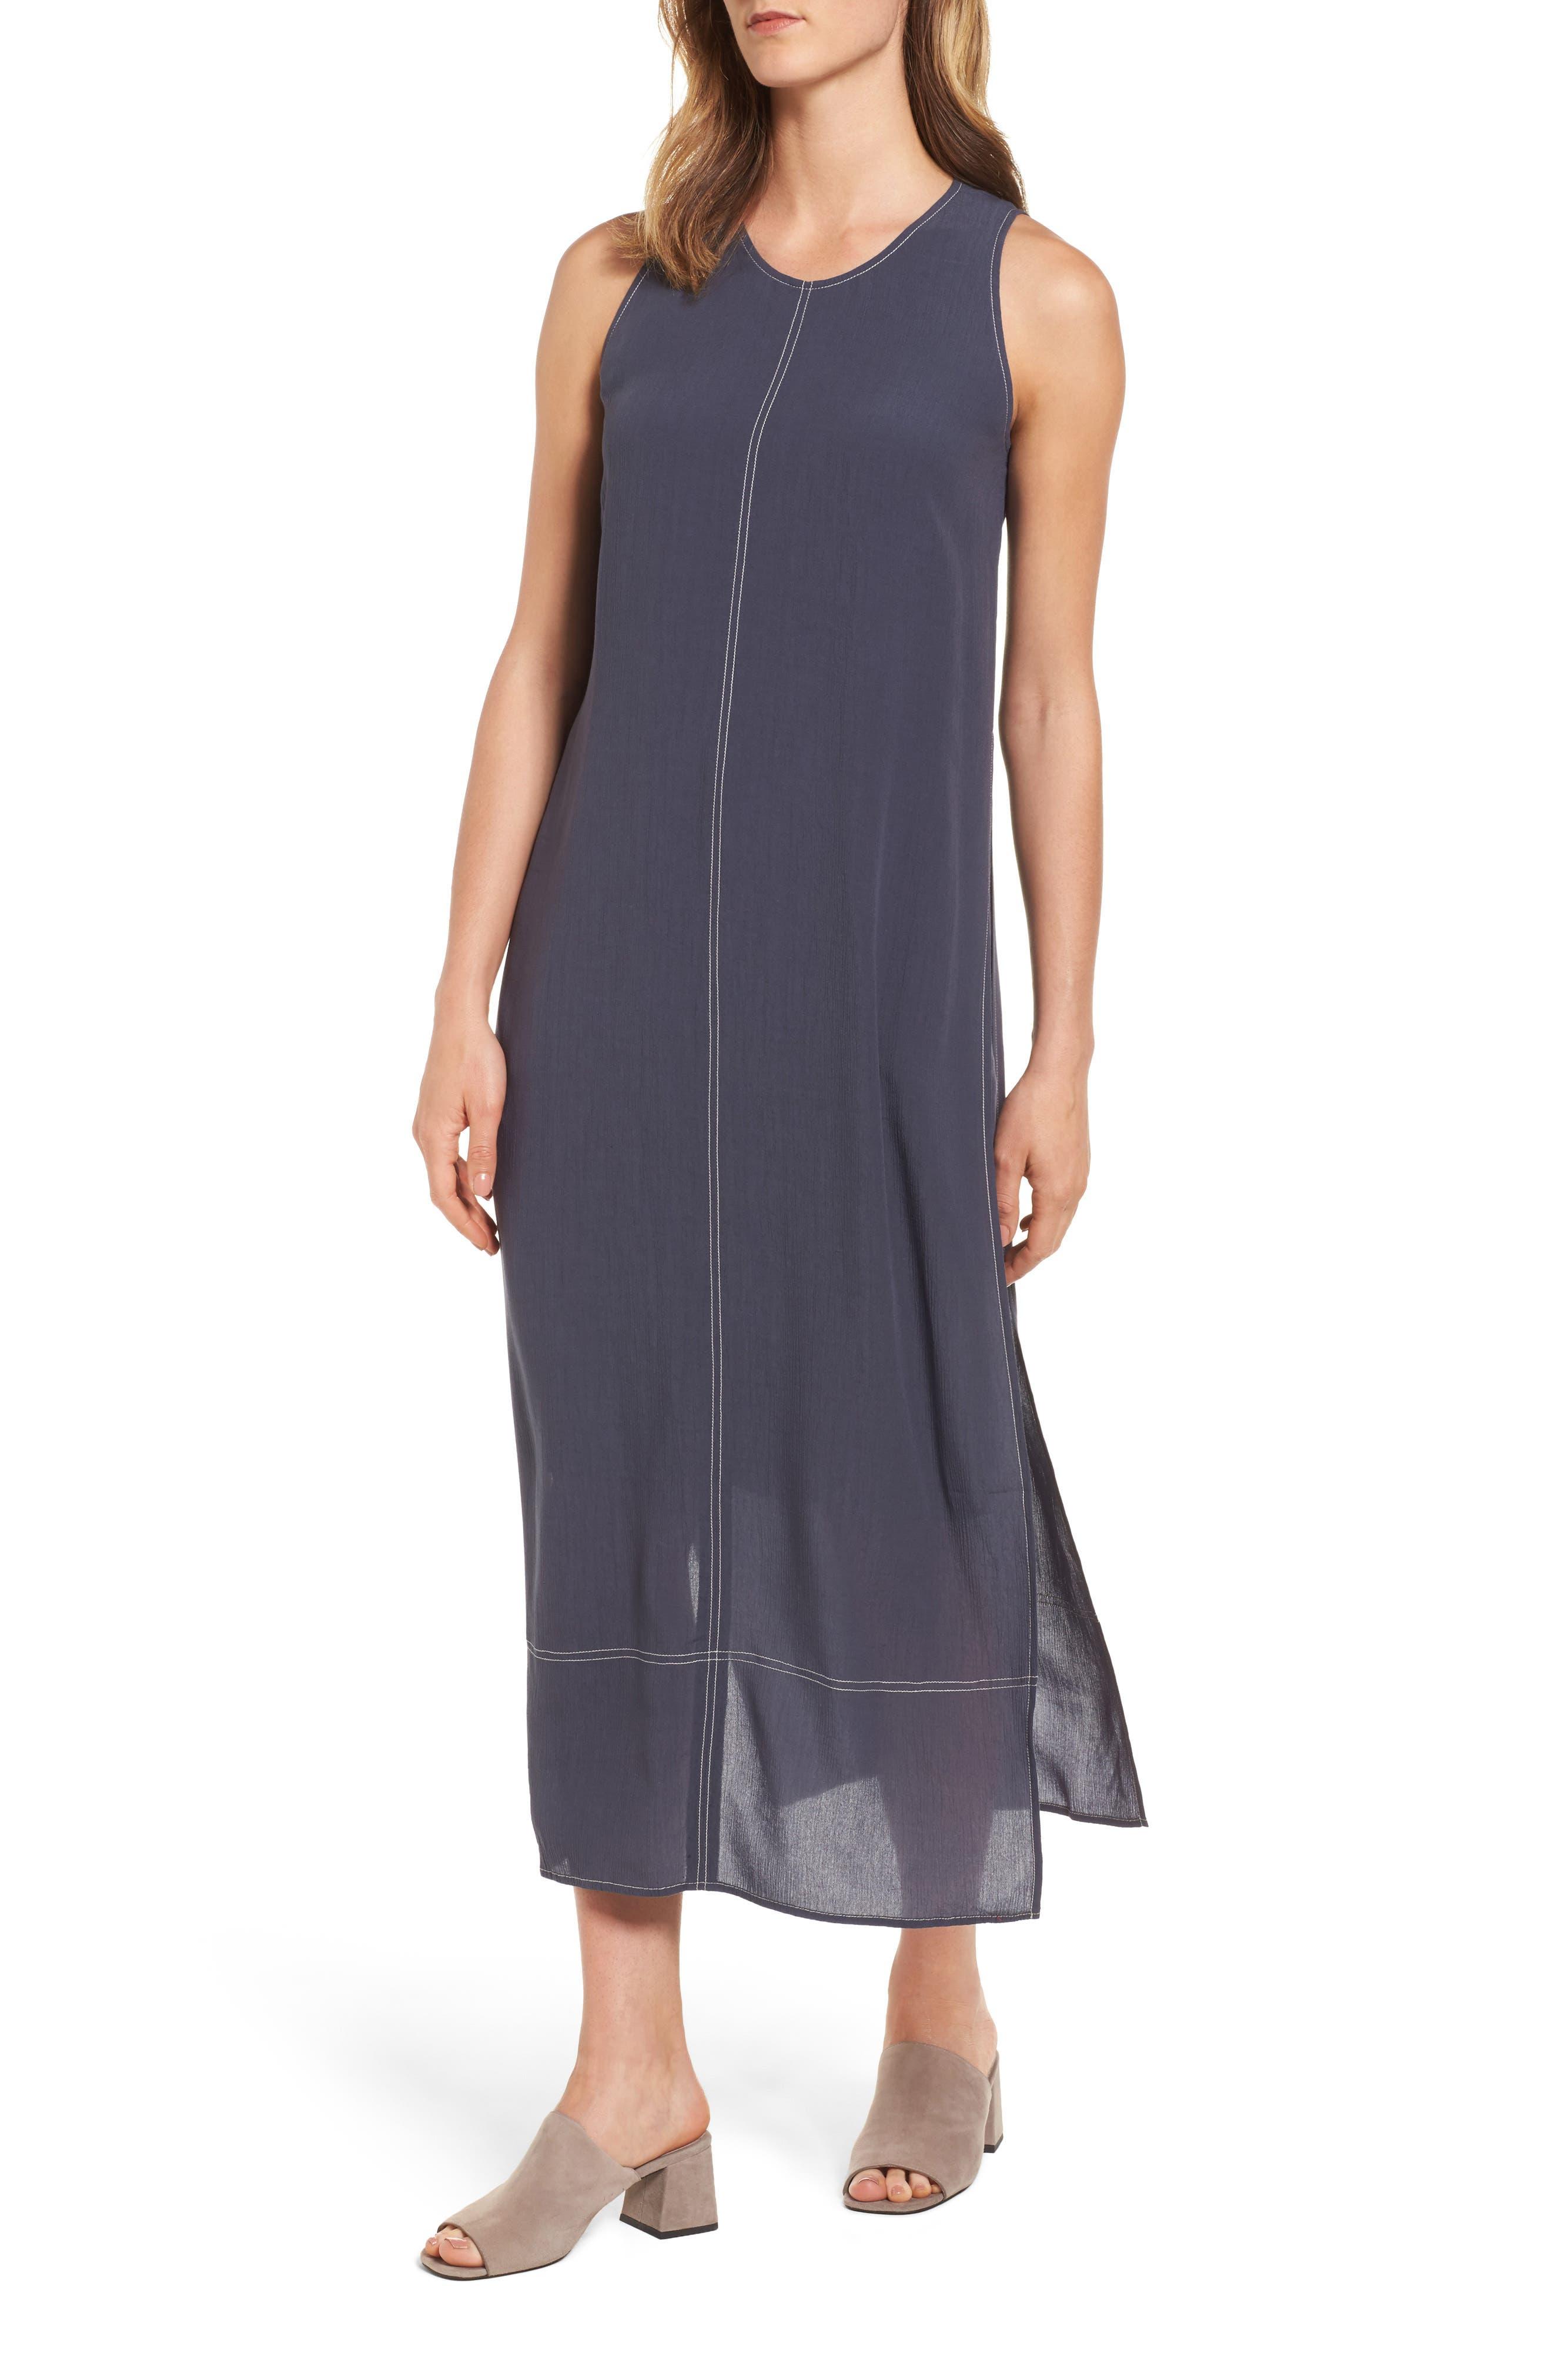 NIC+ZOE Stitched Up Midi Dress